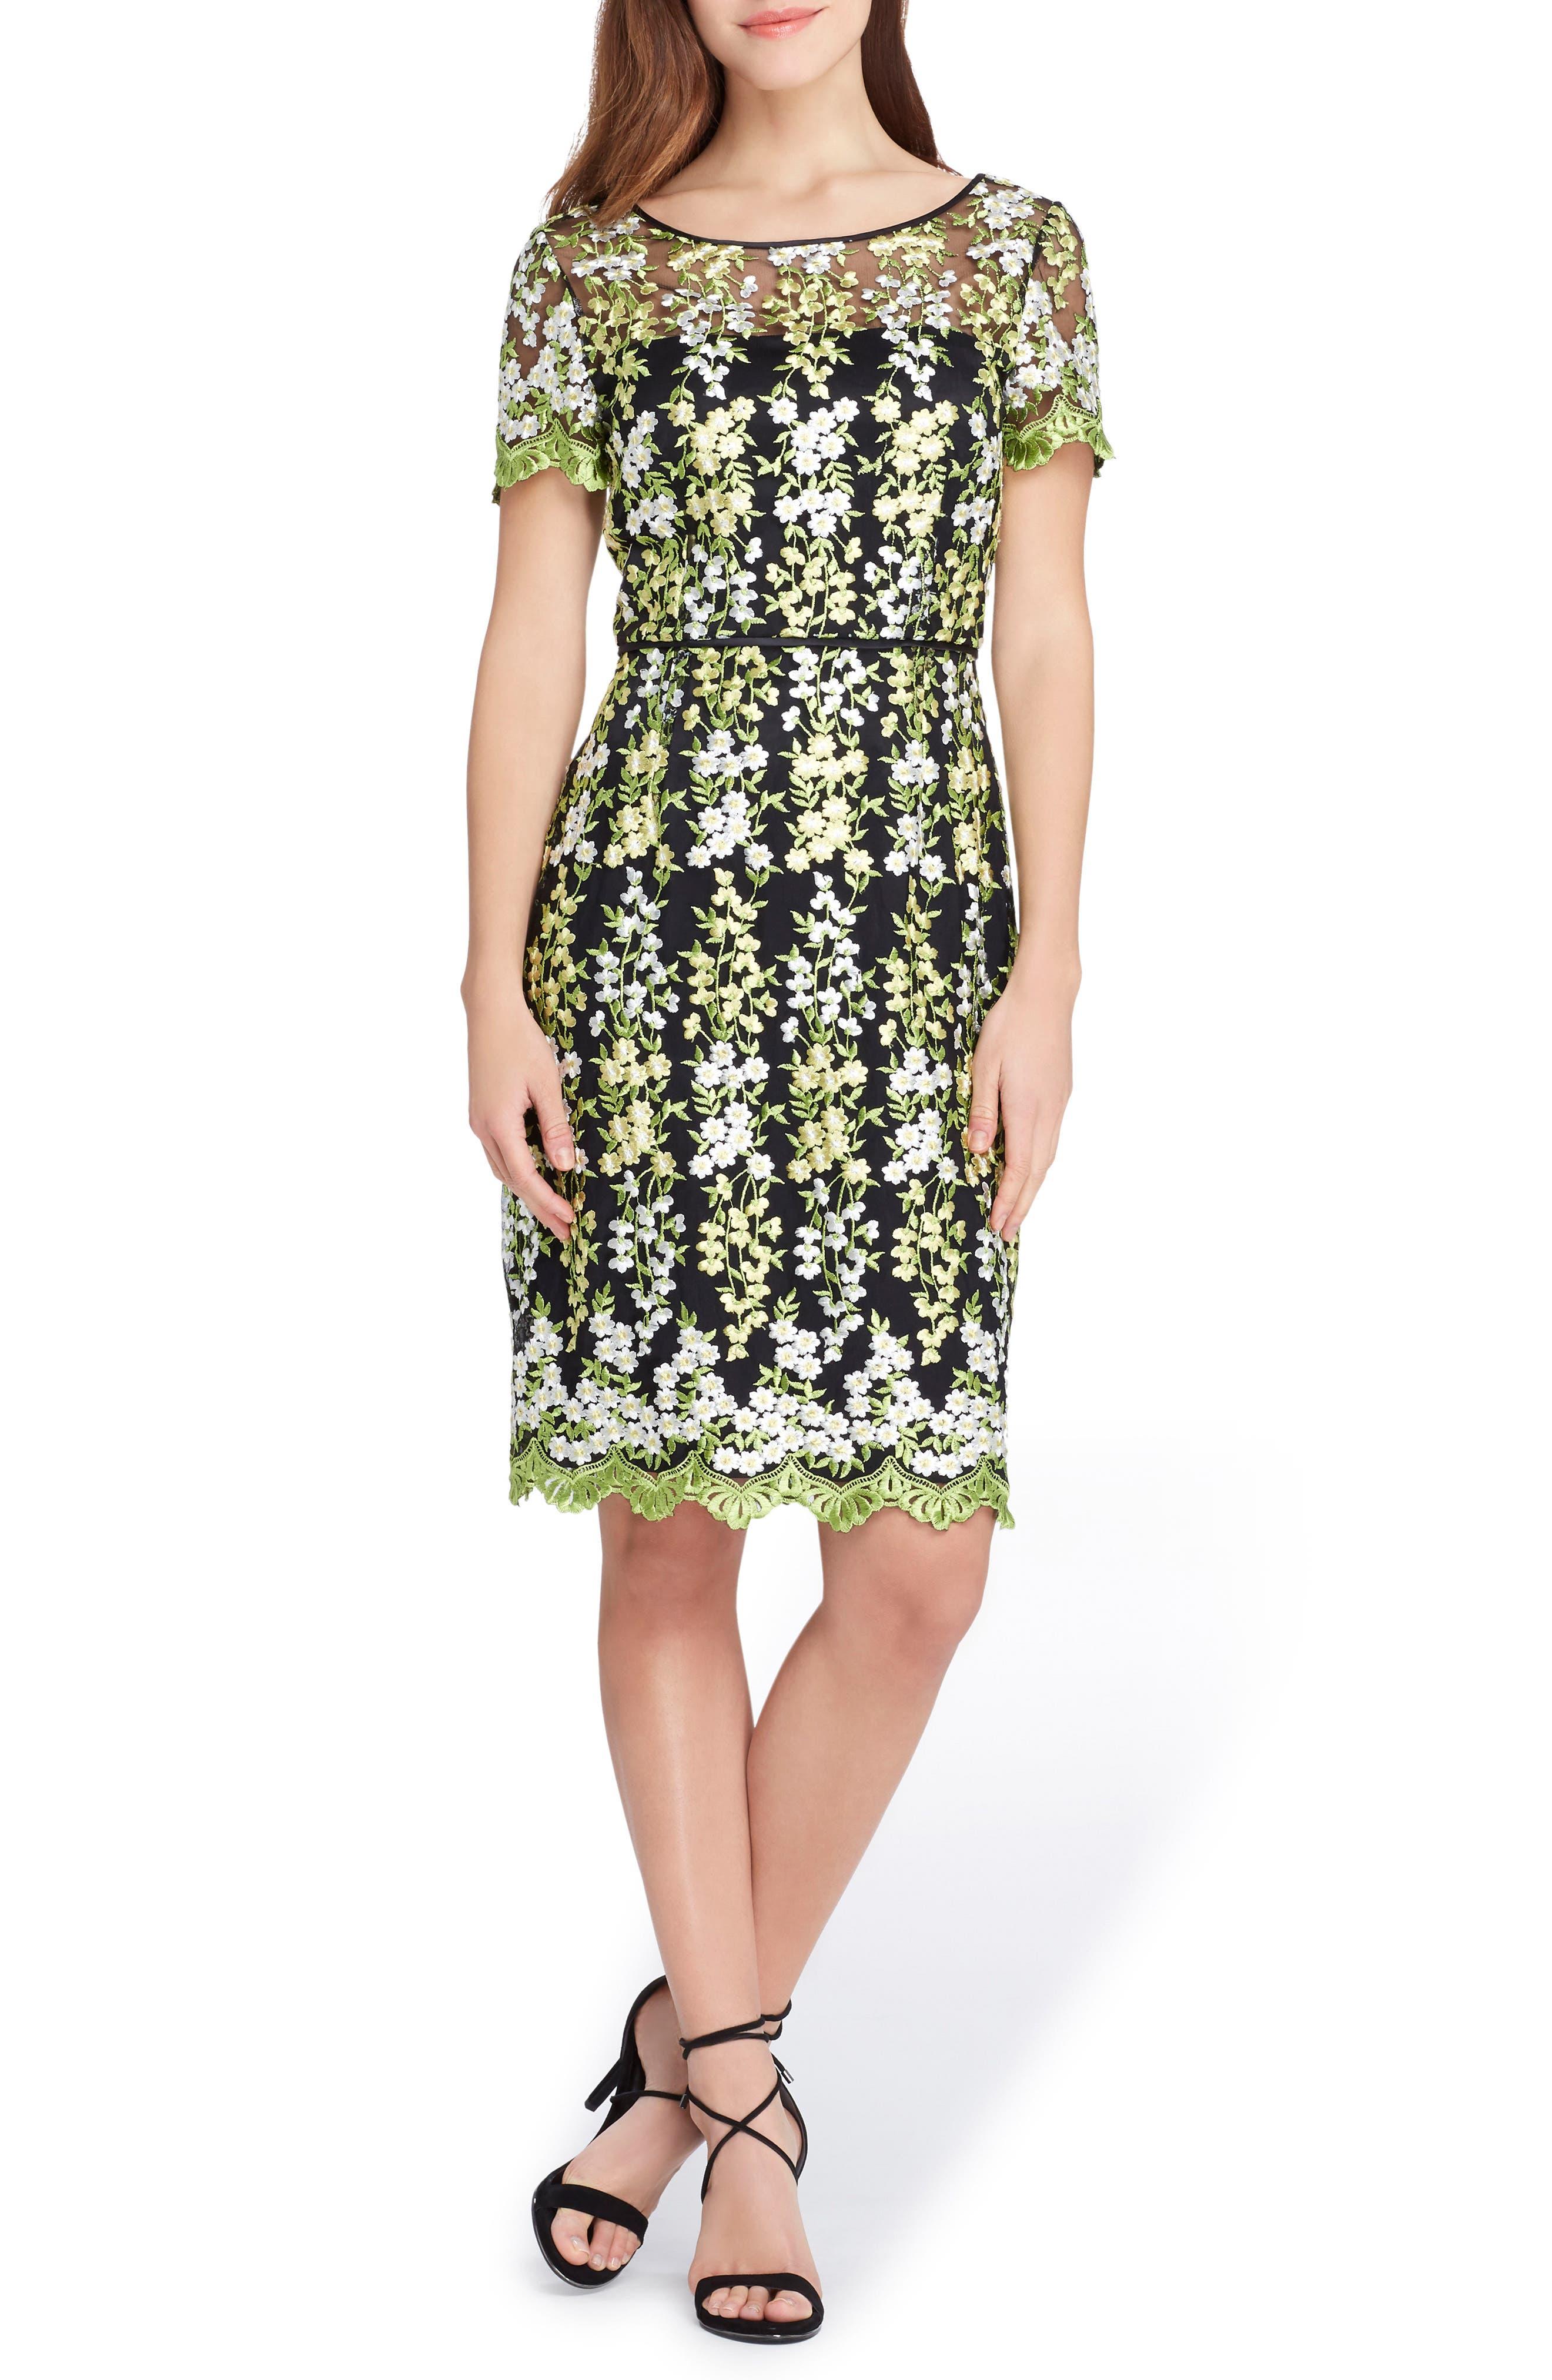 Floral Embroidery Sheath Dress,                             Main thumbnail 1, color,                             Black/ Lemon/ Green